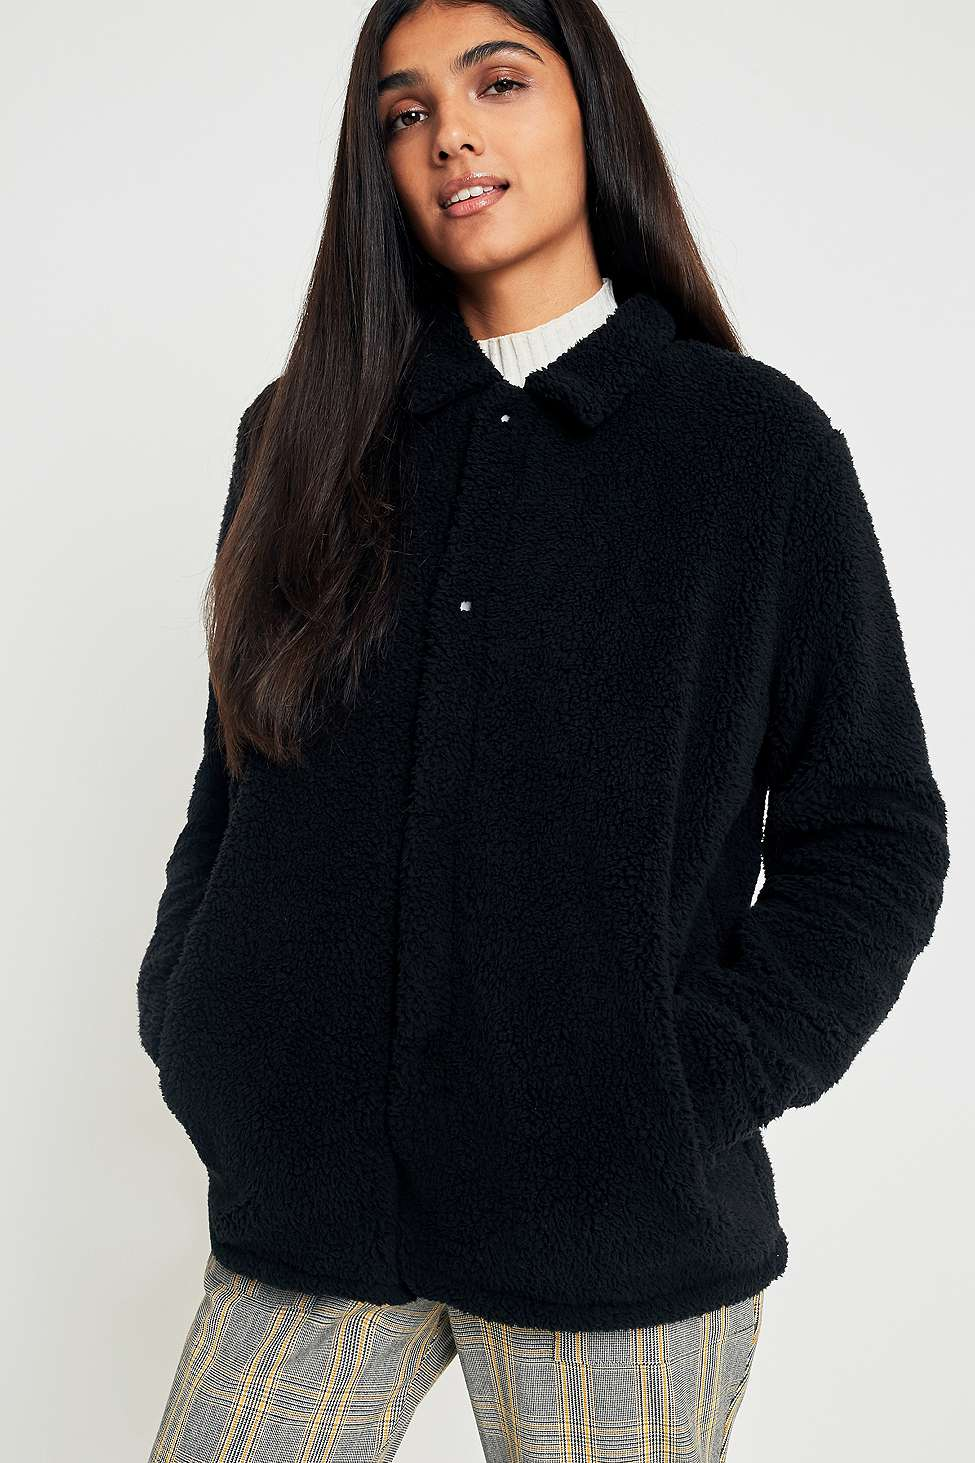 FILA Black Button-Down Teddy Coat, Black